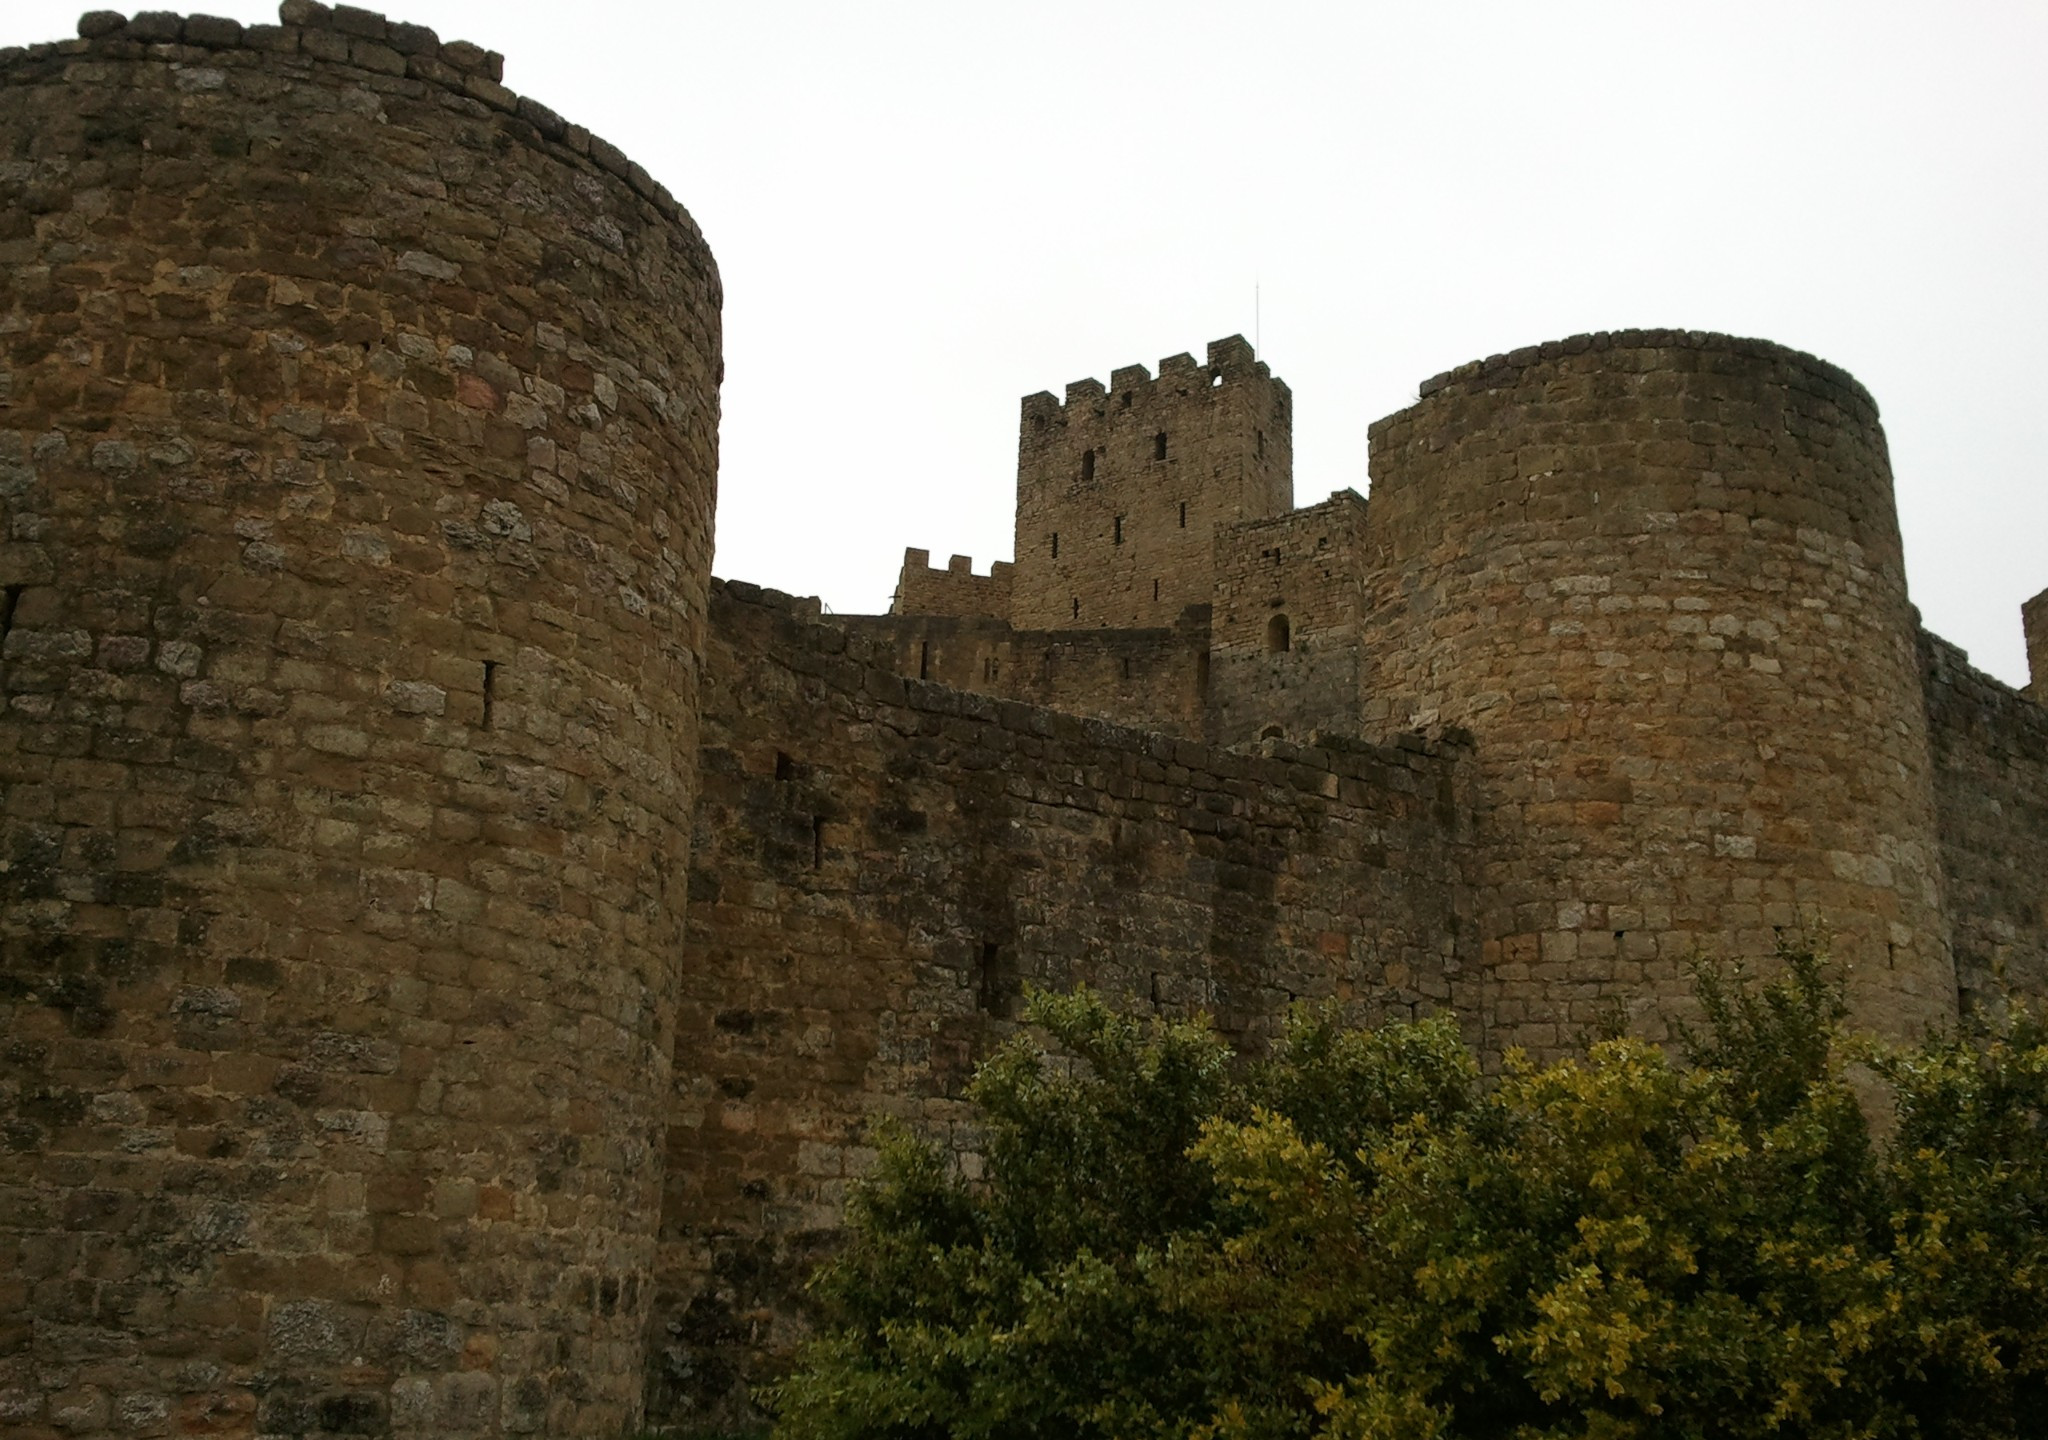 Castillo de Loarre - 13